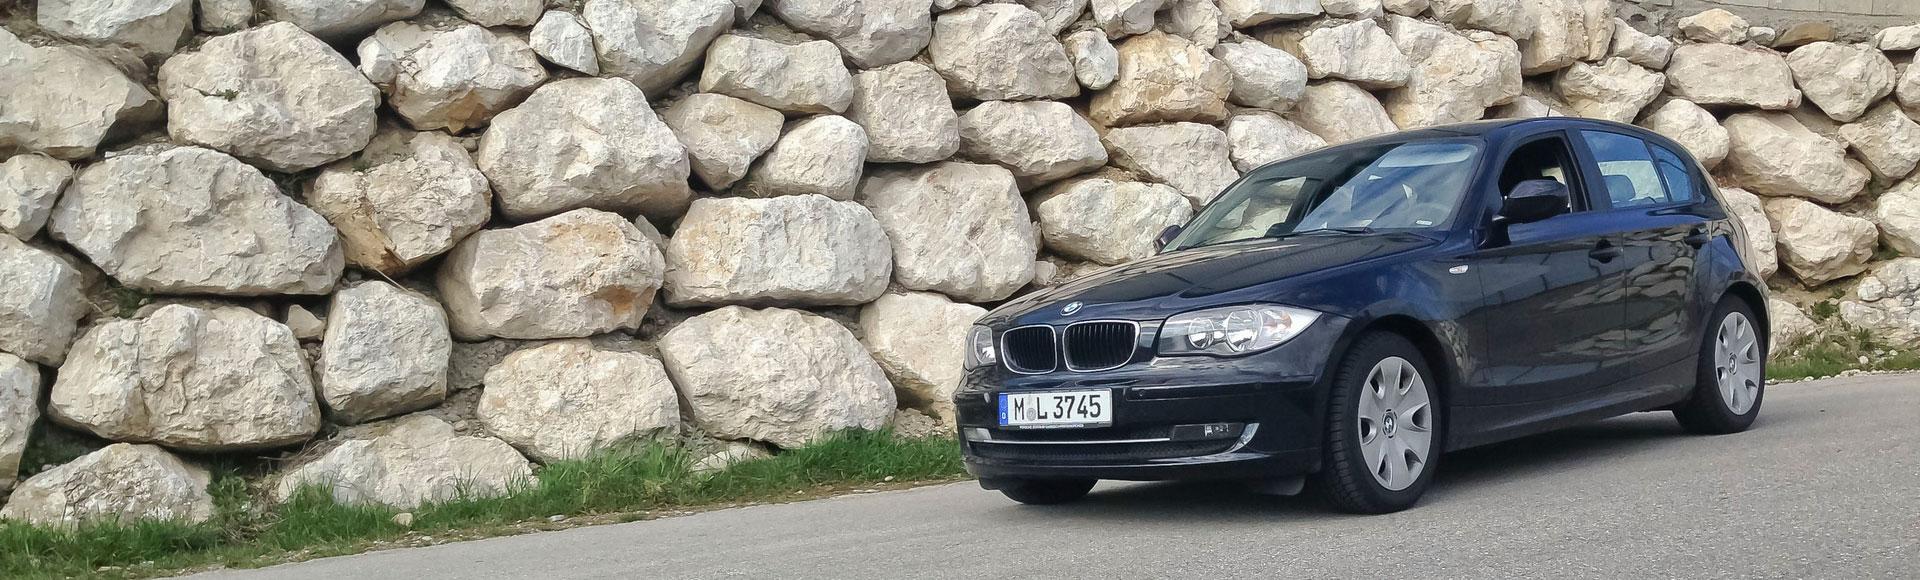 BMW 1er Diesel 2013 2